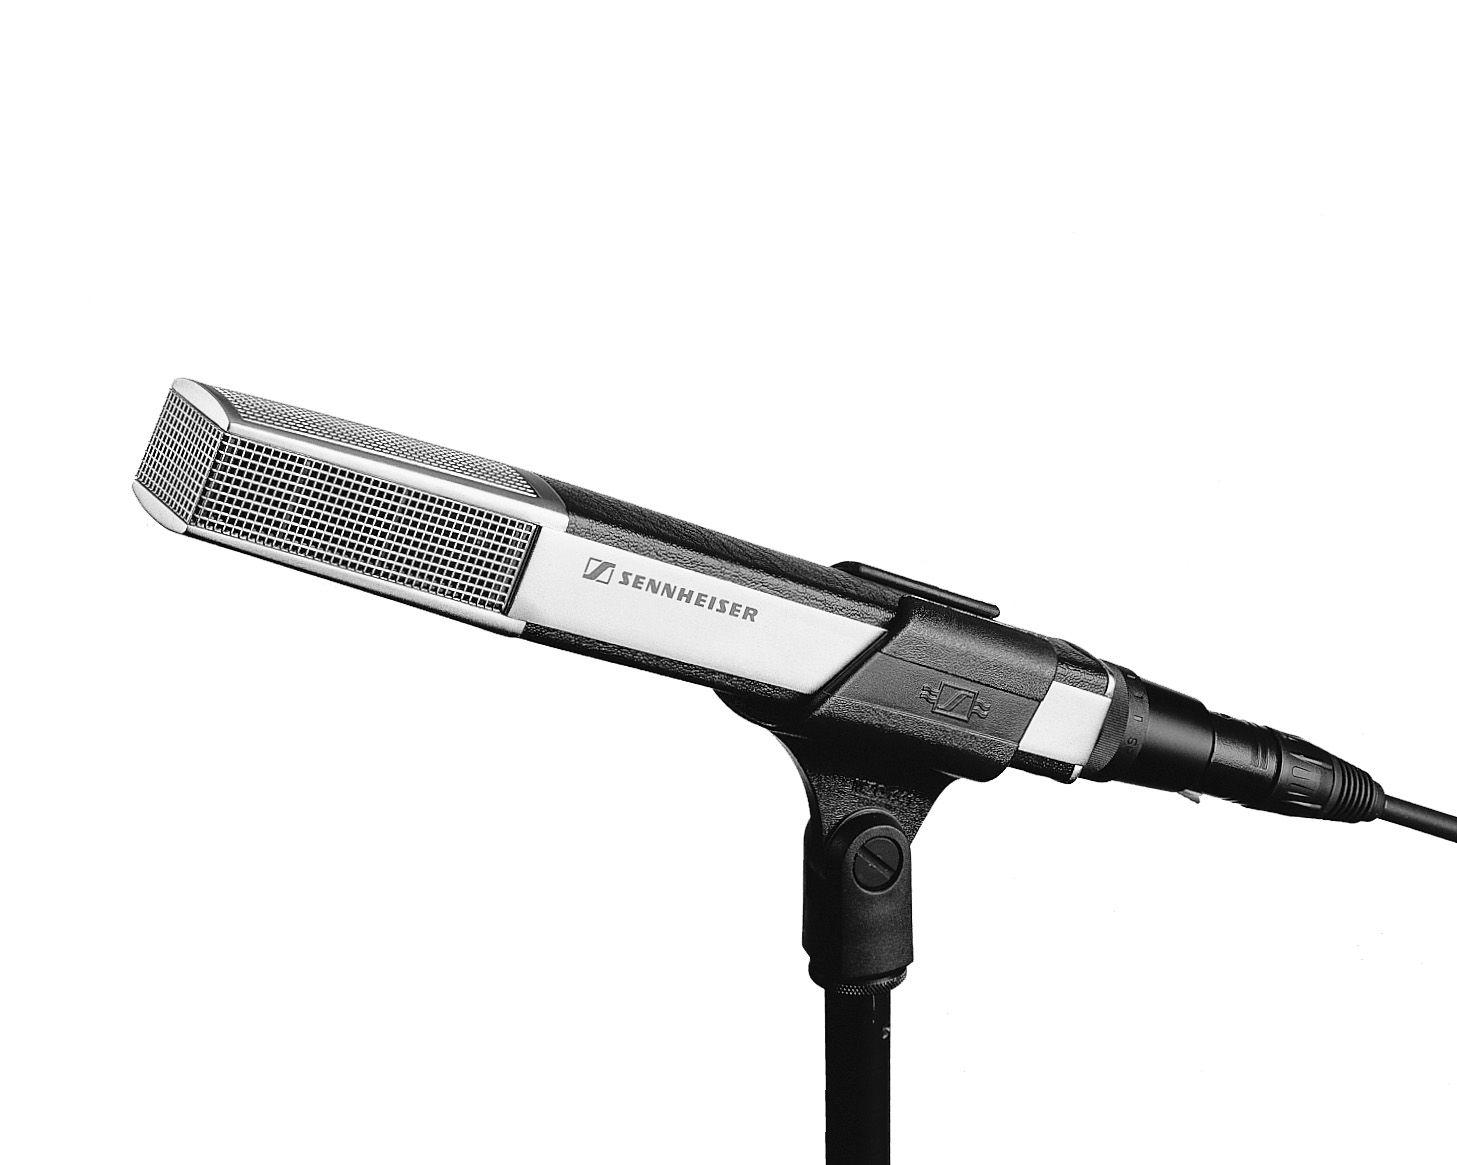 Sennheiser Md 441 Dynamic Microphone Sennheiser Microphone Microphones